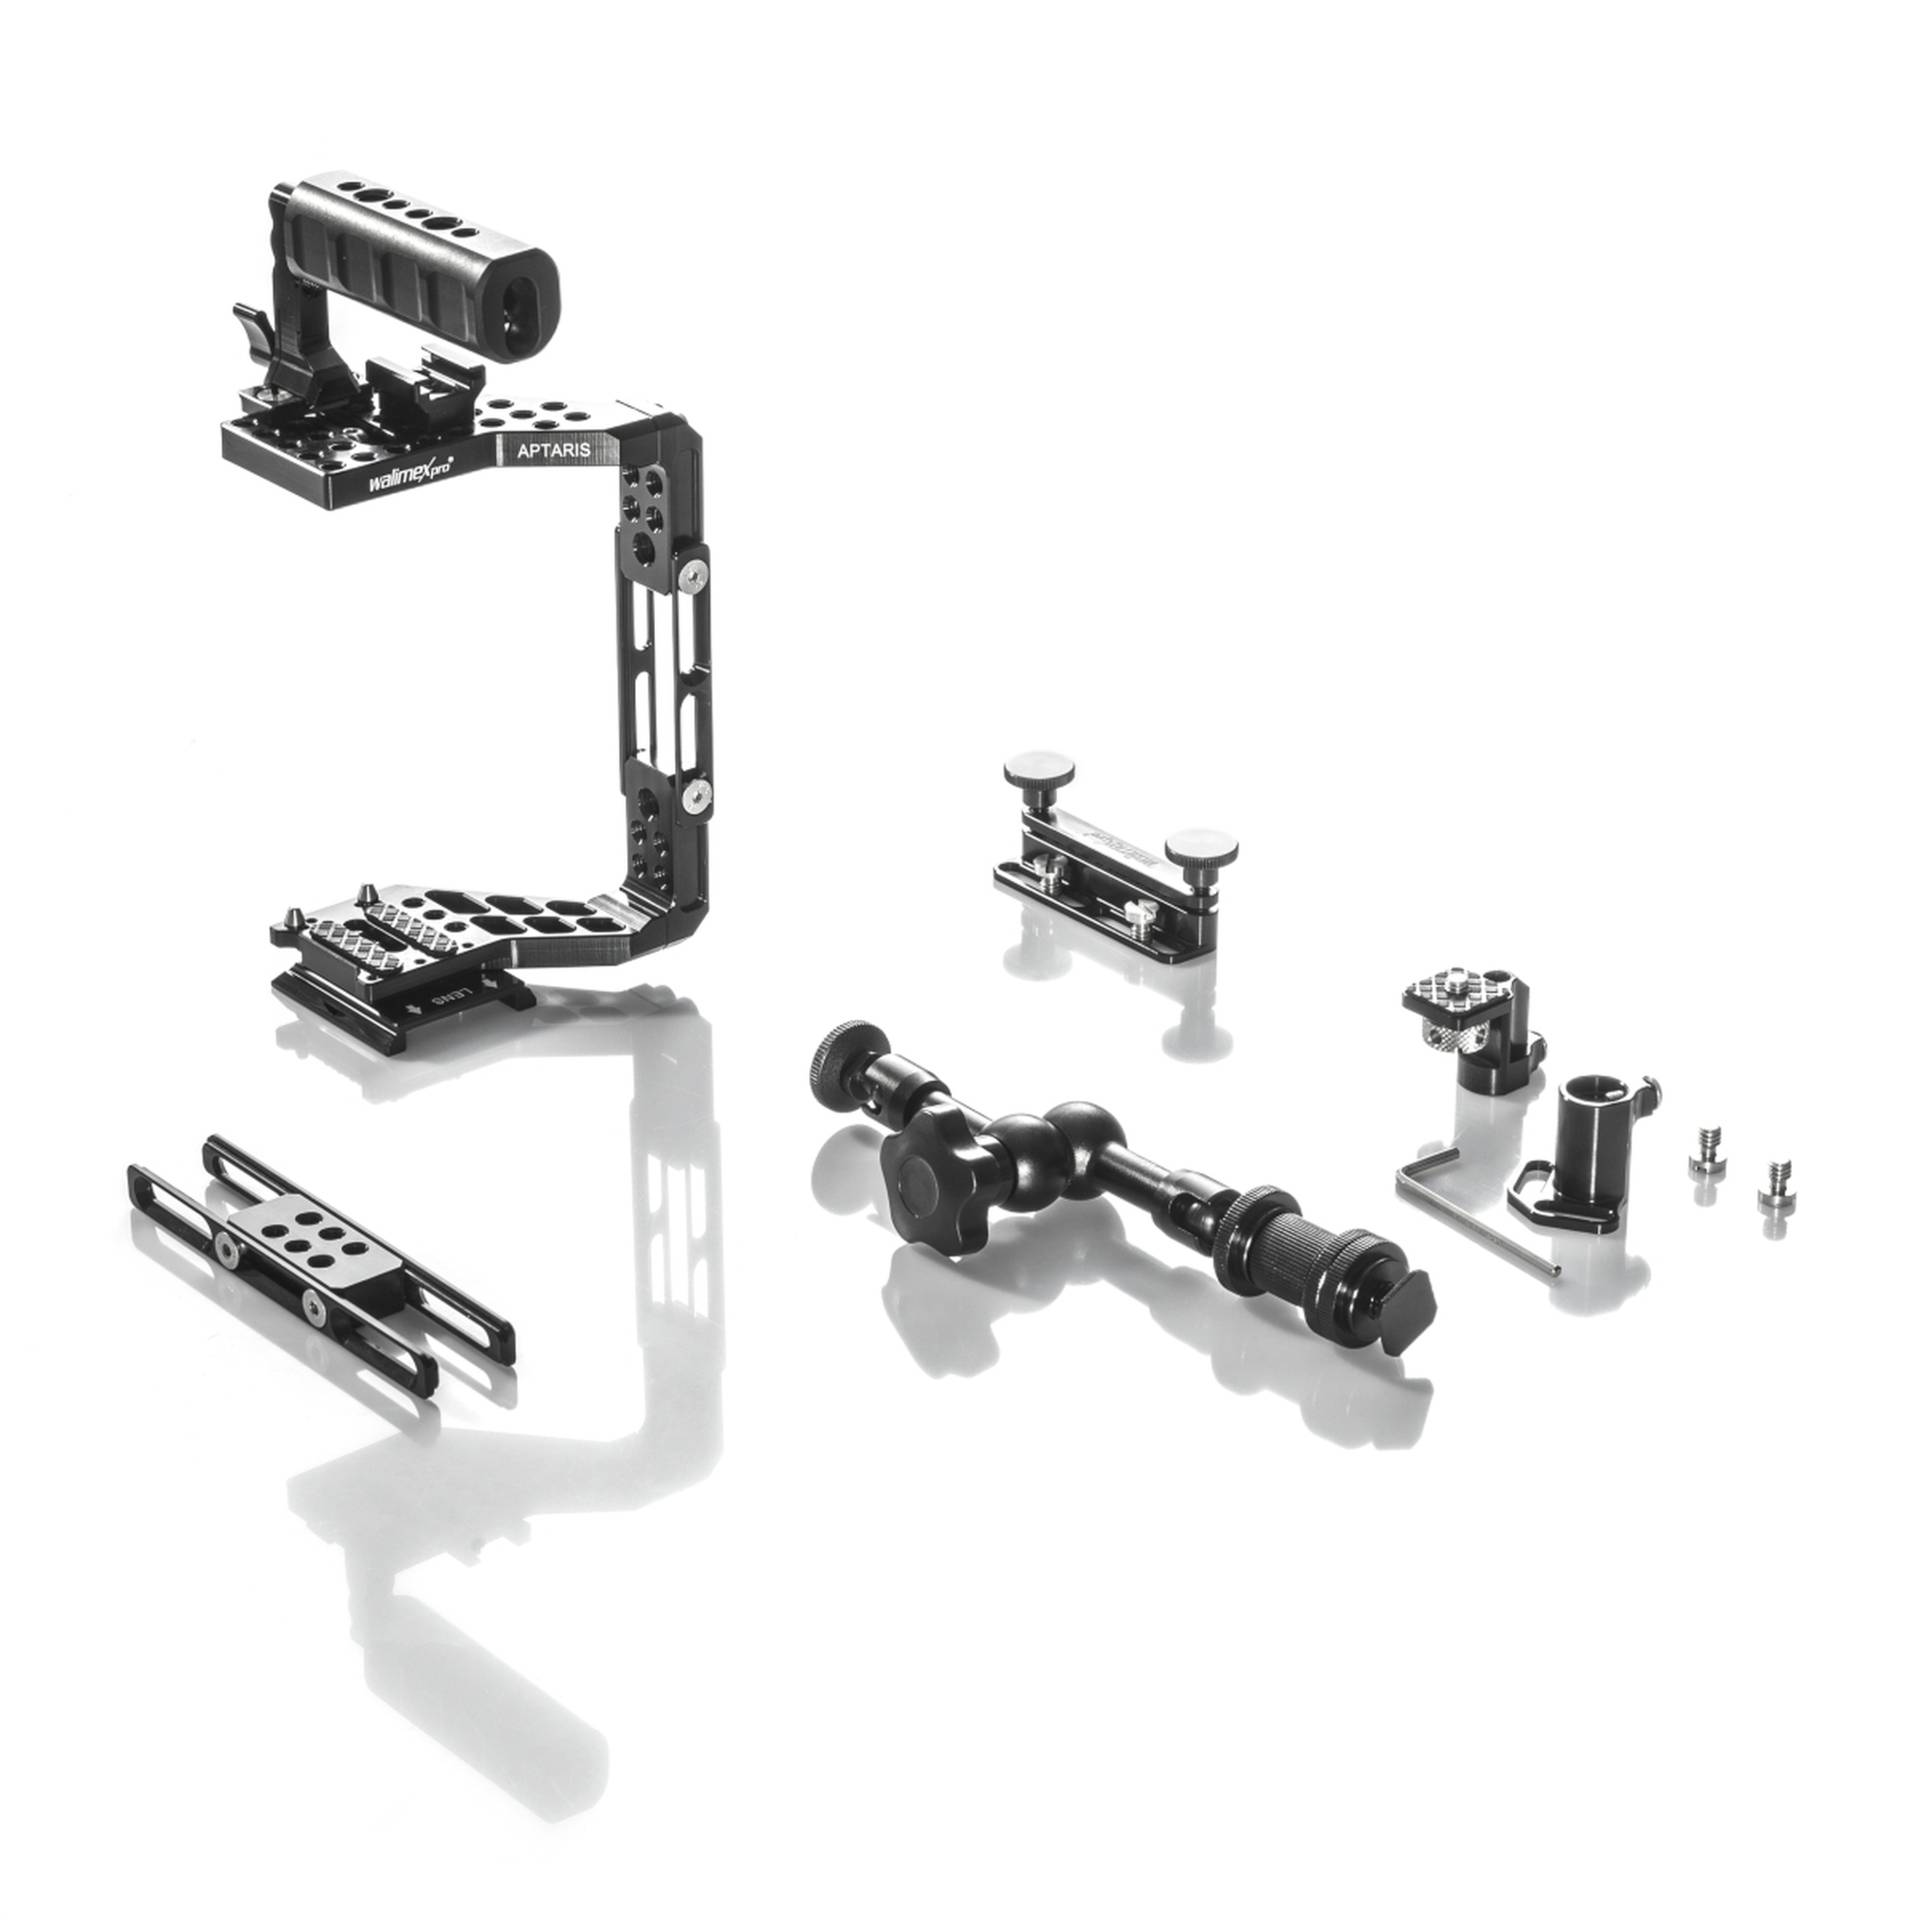 Walimex Pro Aptaris Unversal XL MKII Plus Set